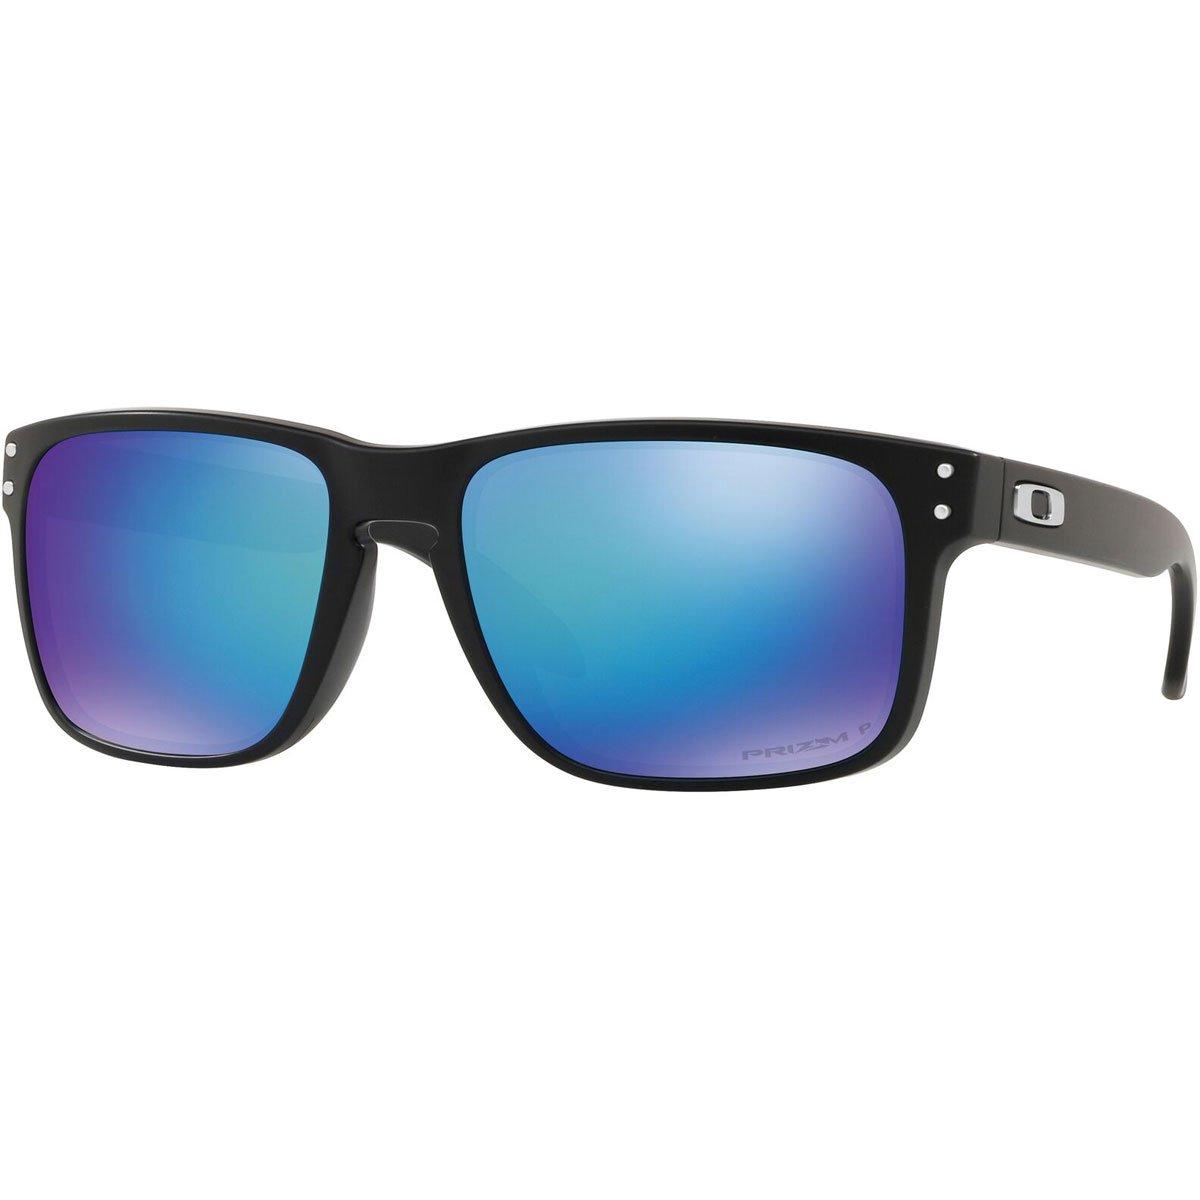 bf00cb847eb2 Oakley Men's Holbrook 9102F0 Sunglasses, Matte  Black/Prizmsapphirepolarized, 55: Amazon.co.uk: Clothing